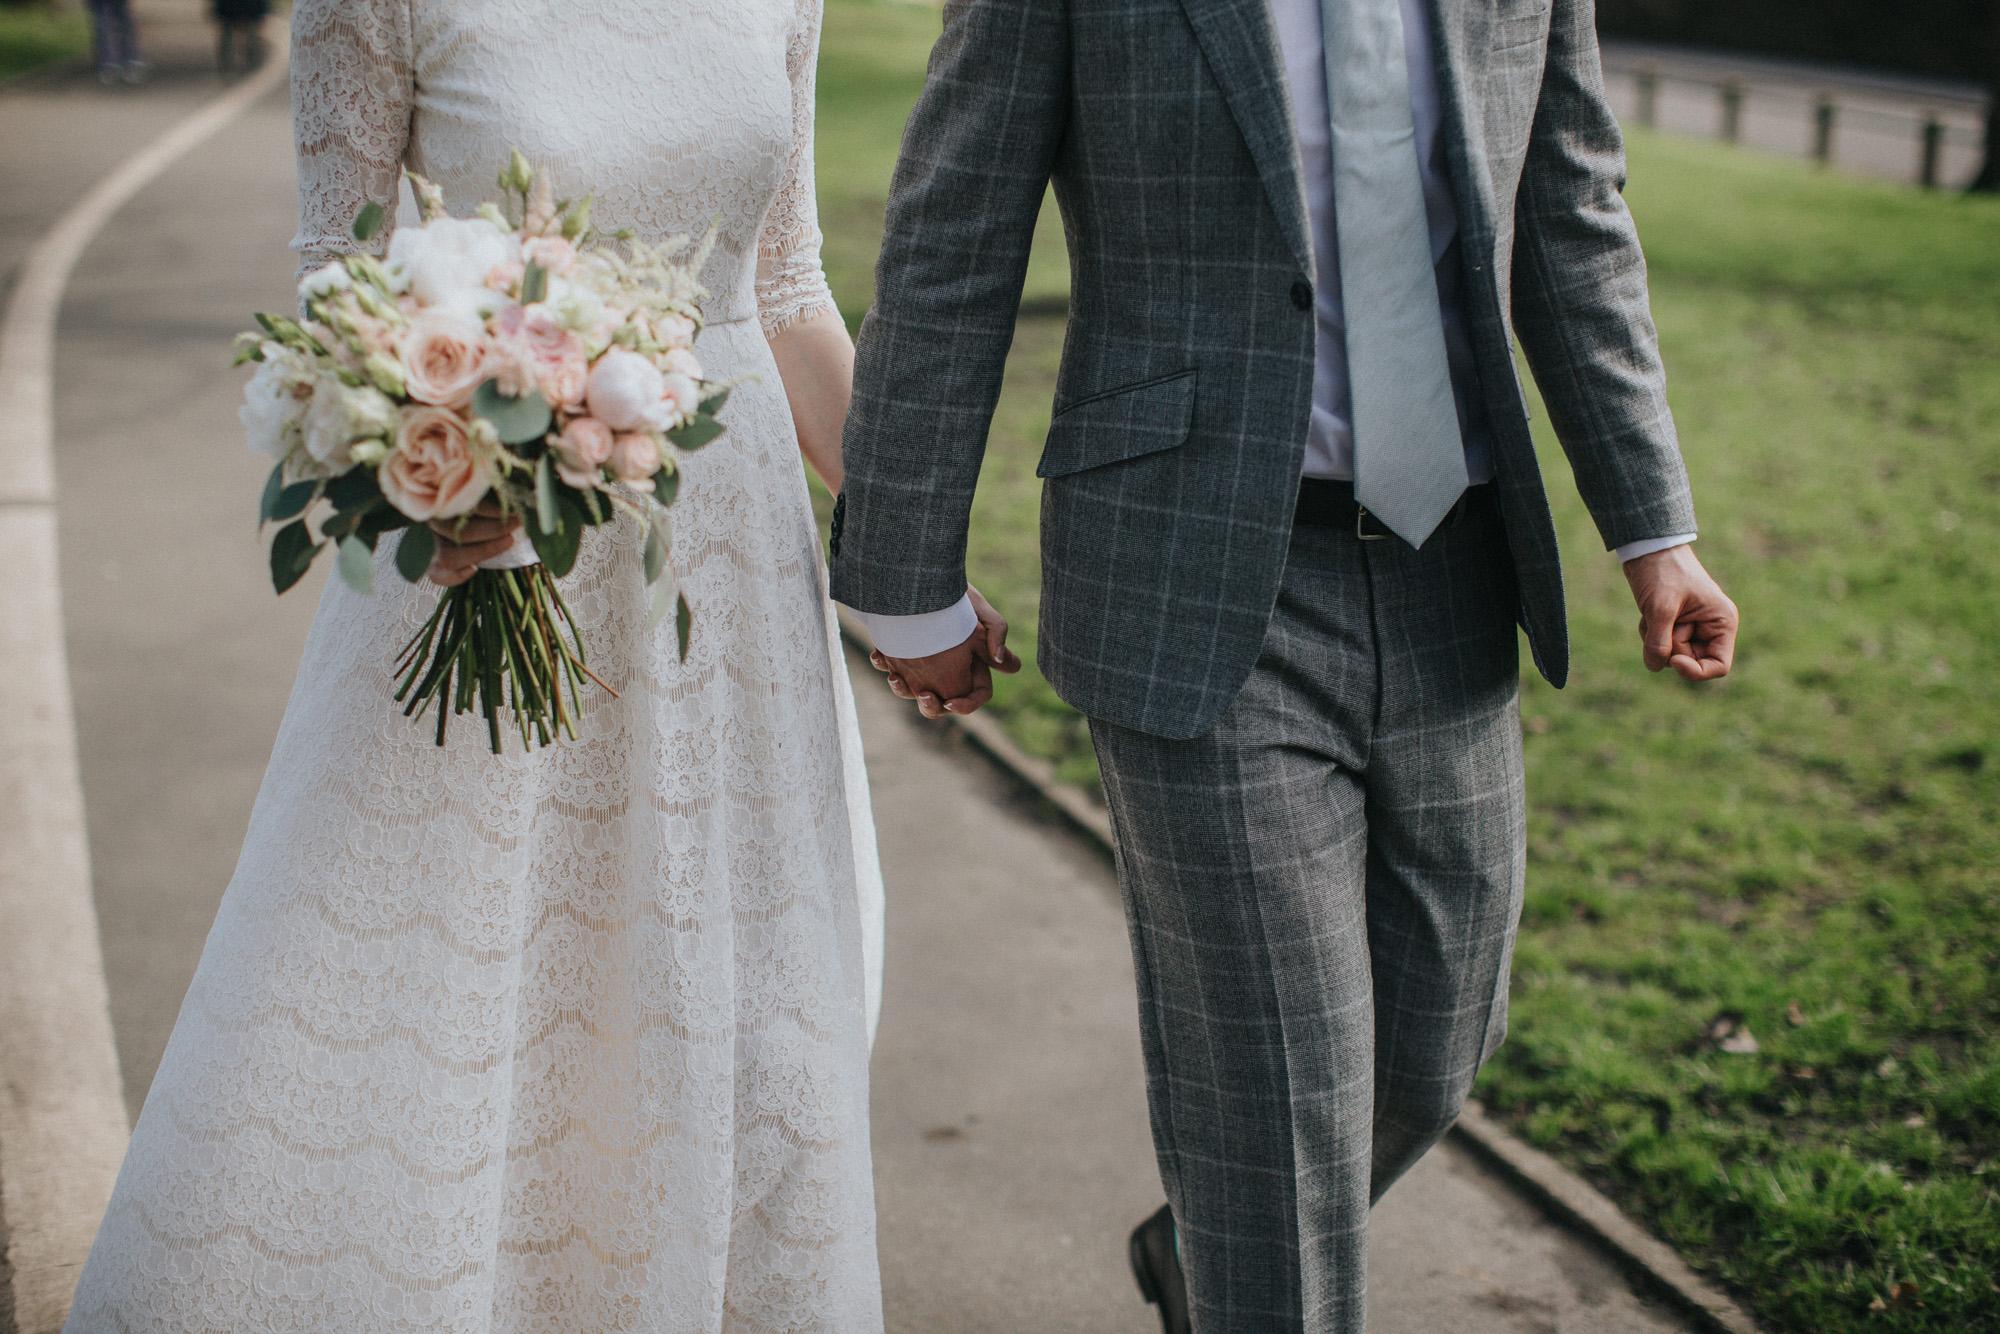 Kate-Beaumont-Lace-Flared-Dahlia-Gown-Leeds-Wedding-Bloom-Weddings-36.jpg